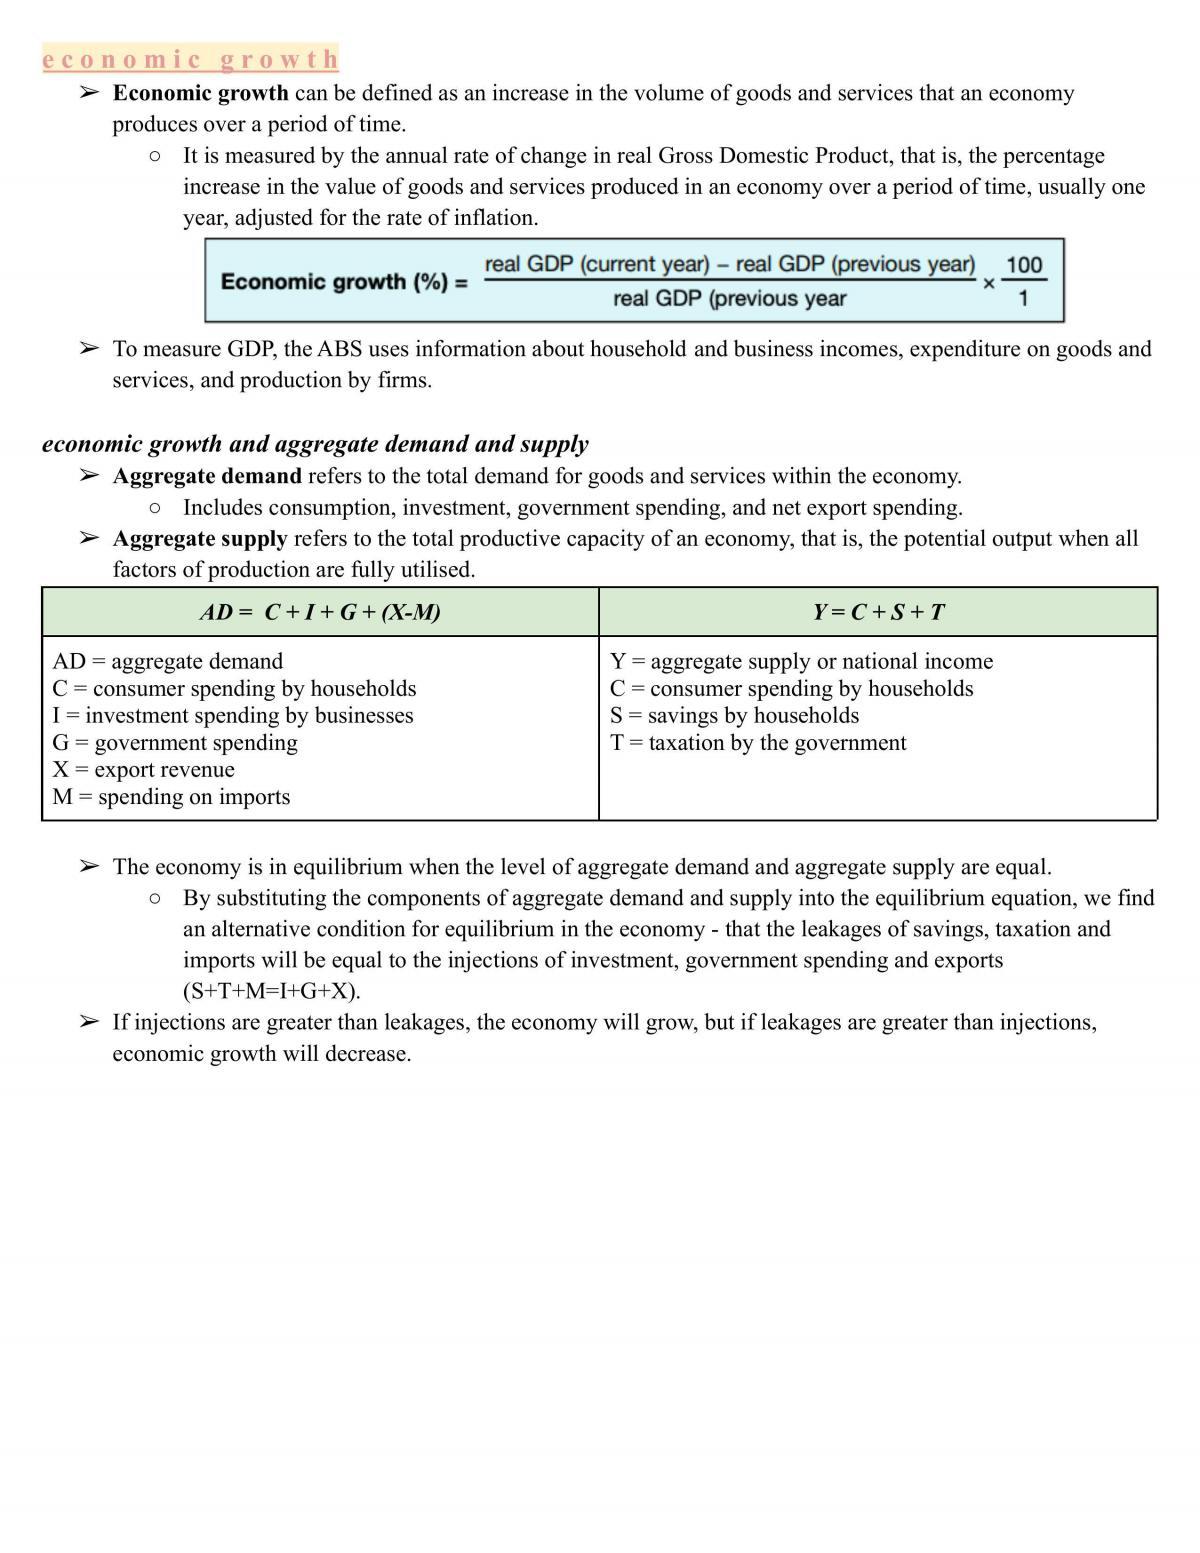 Economics - Topic 3: Economic Issues (notes) - Page 1